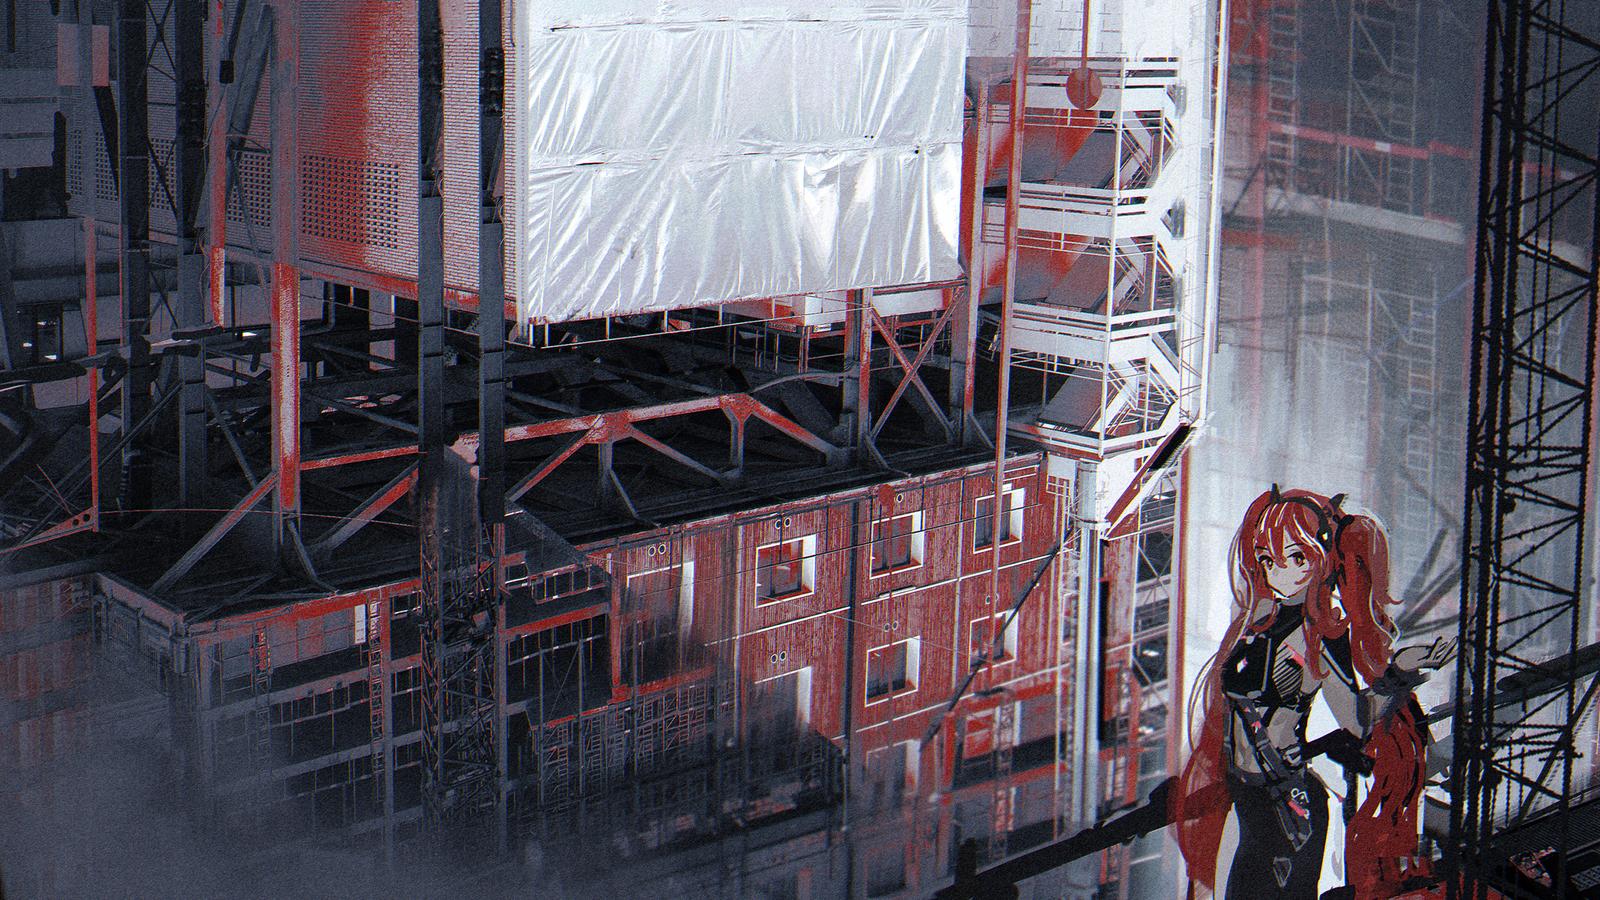 machine-city-scenery-anime-original-scifi-4k-y0.jpg